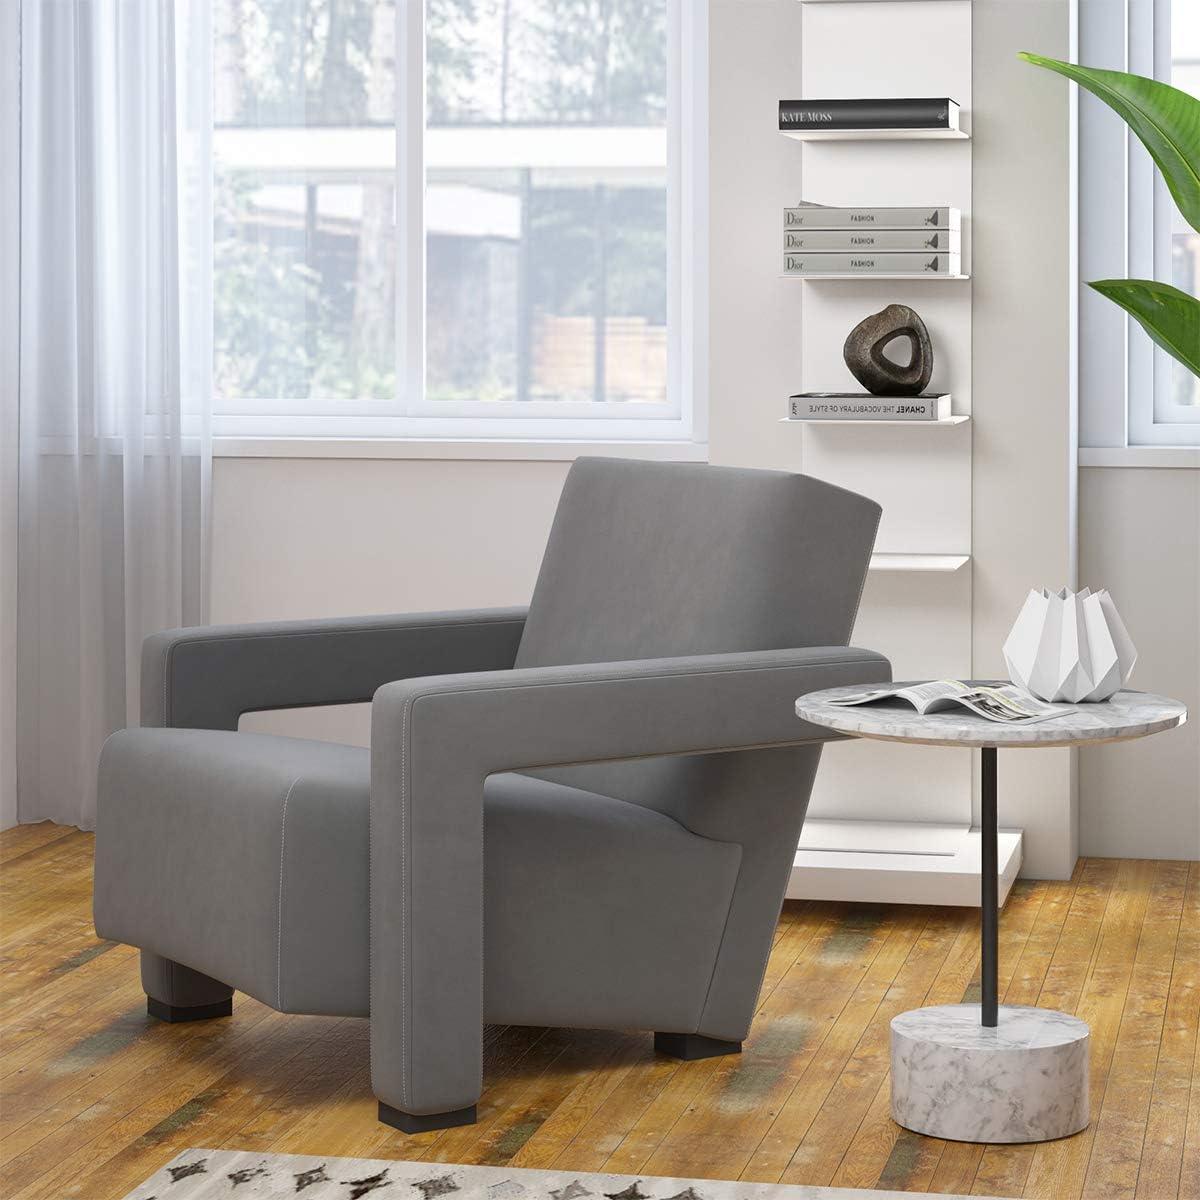 MEXIYA Hughe Modern Grey Textured Velvet Upholstered Accent Lounge Arm Chair